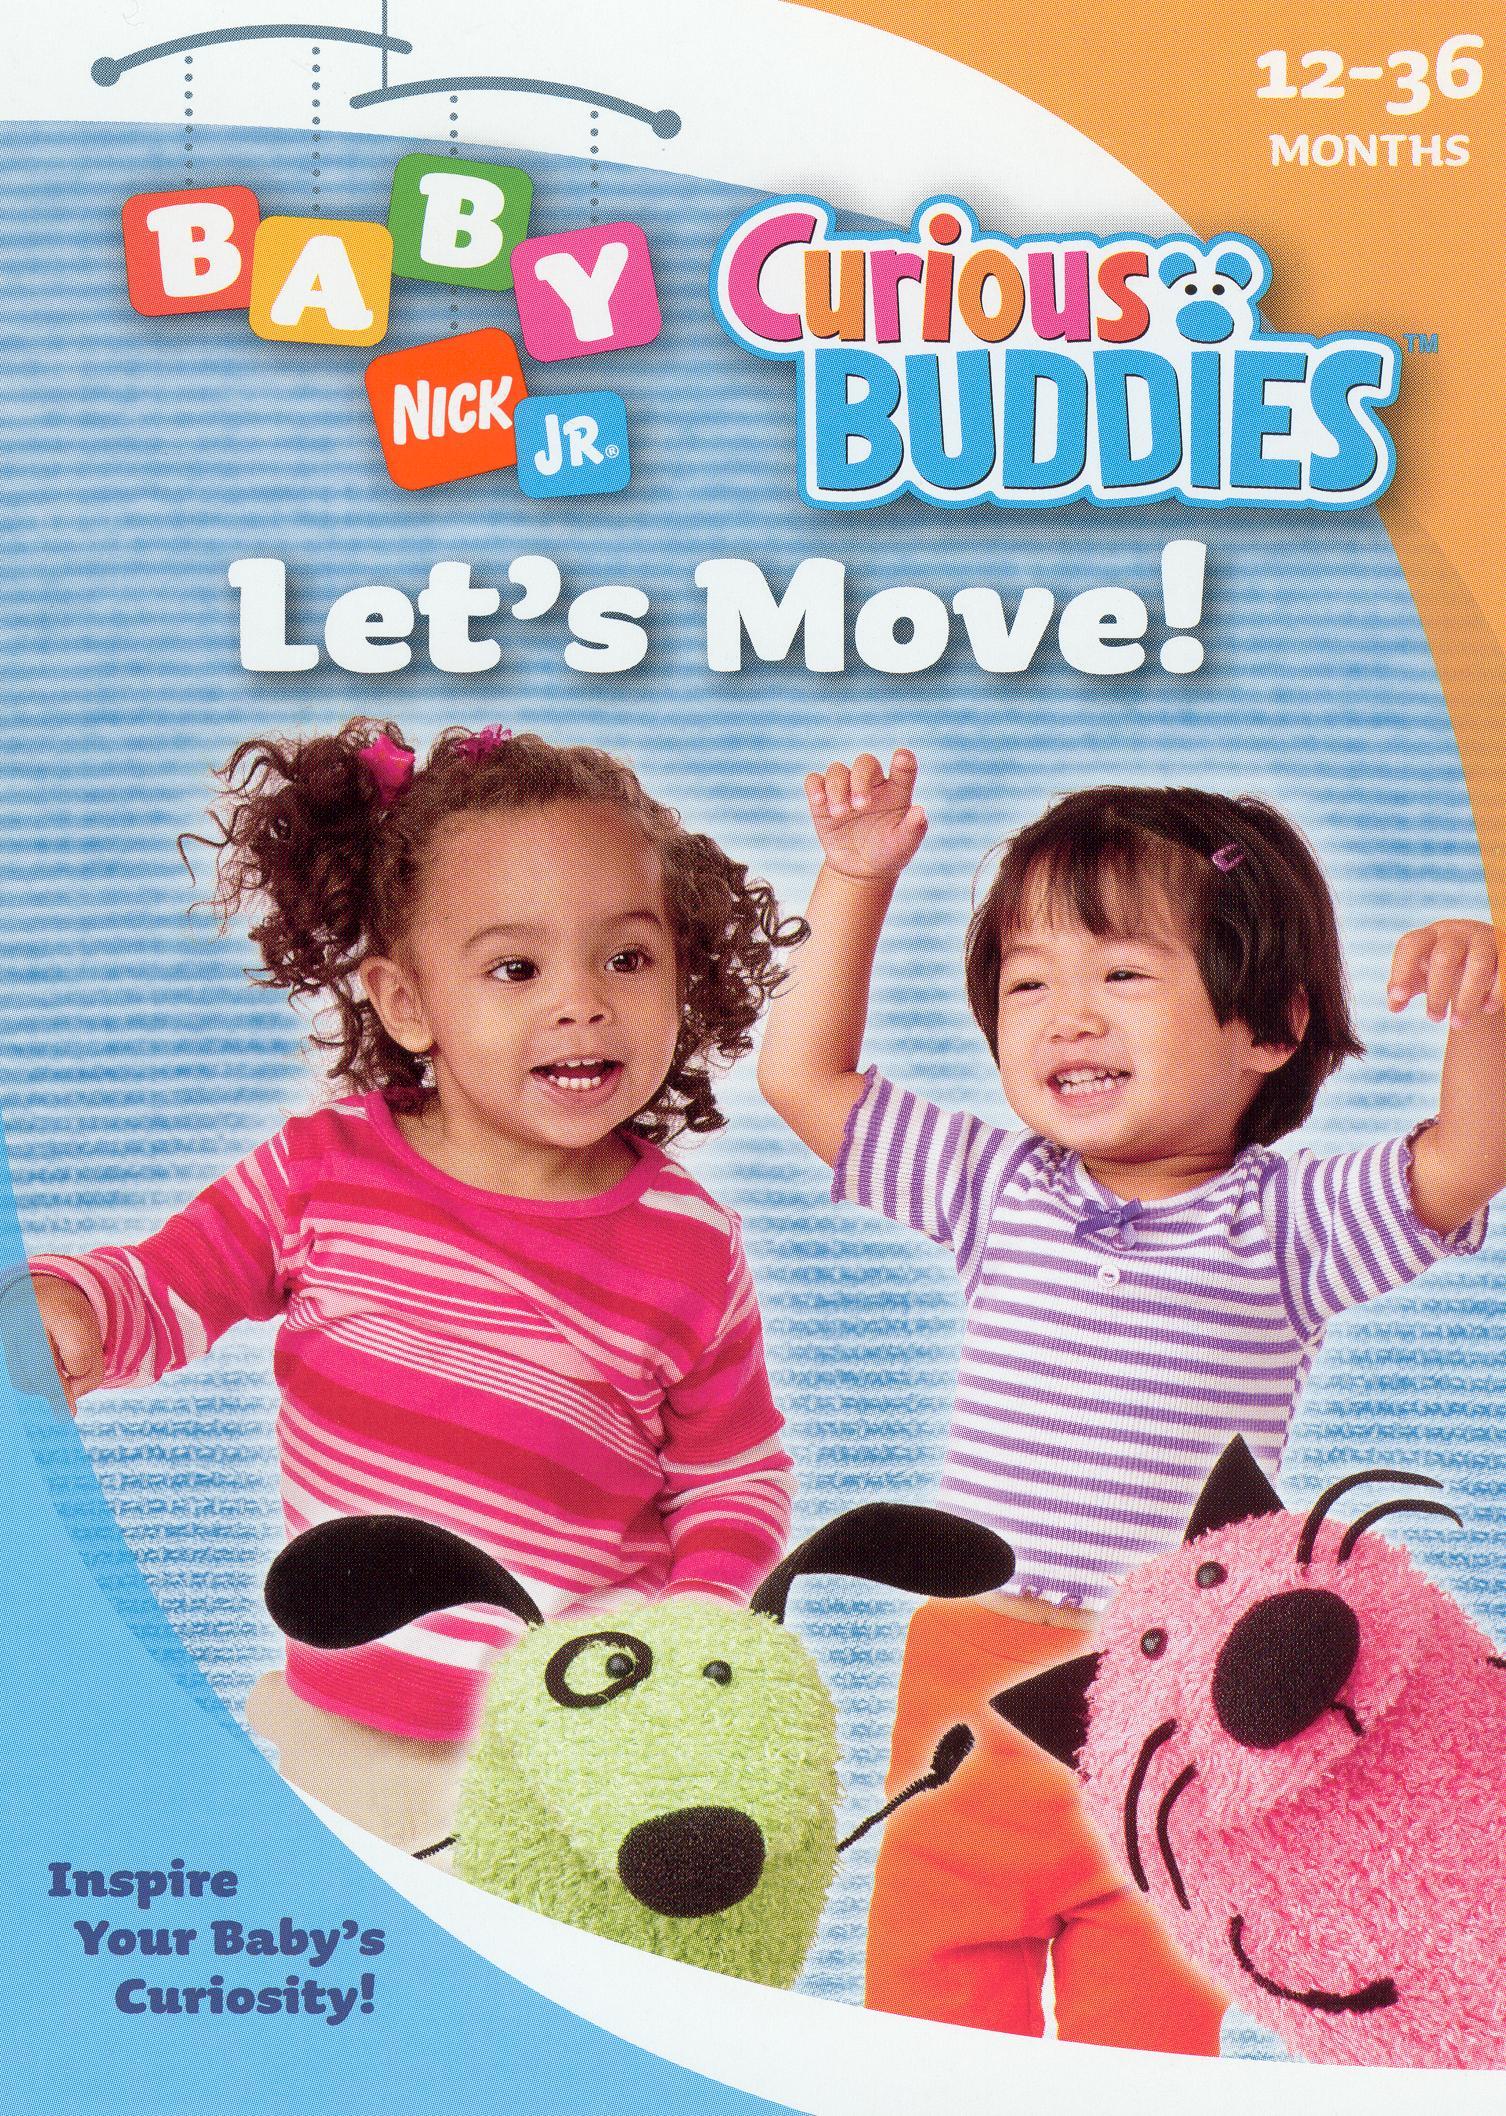 Curious Buddies: Let's Move!